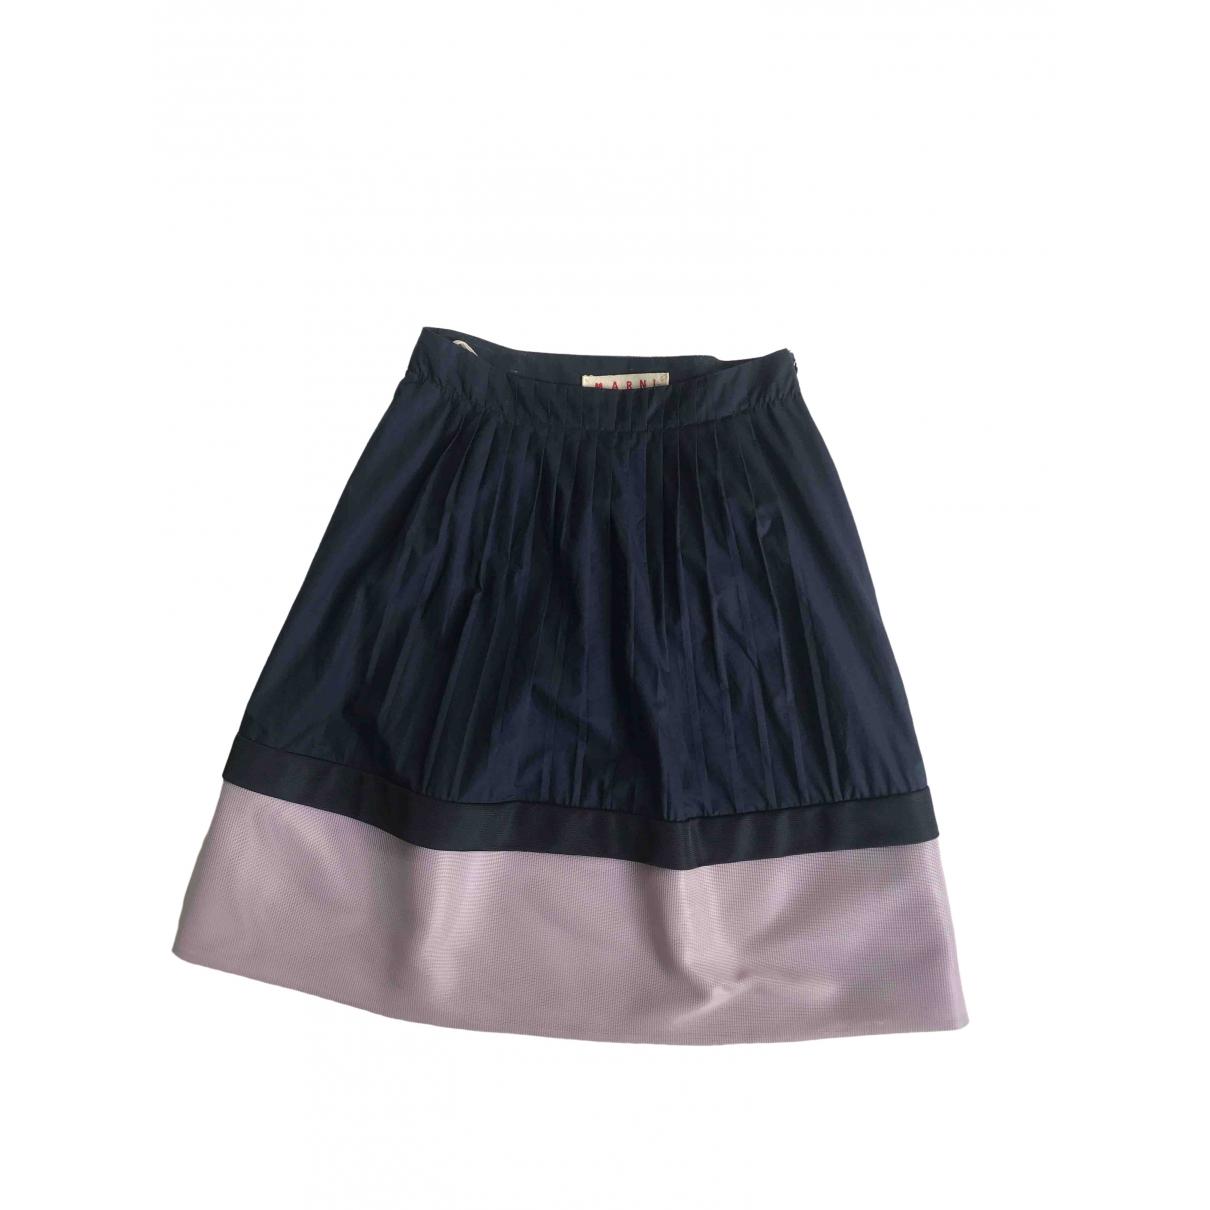 Marni \N Blue Cotton skirt for Women 42 IT